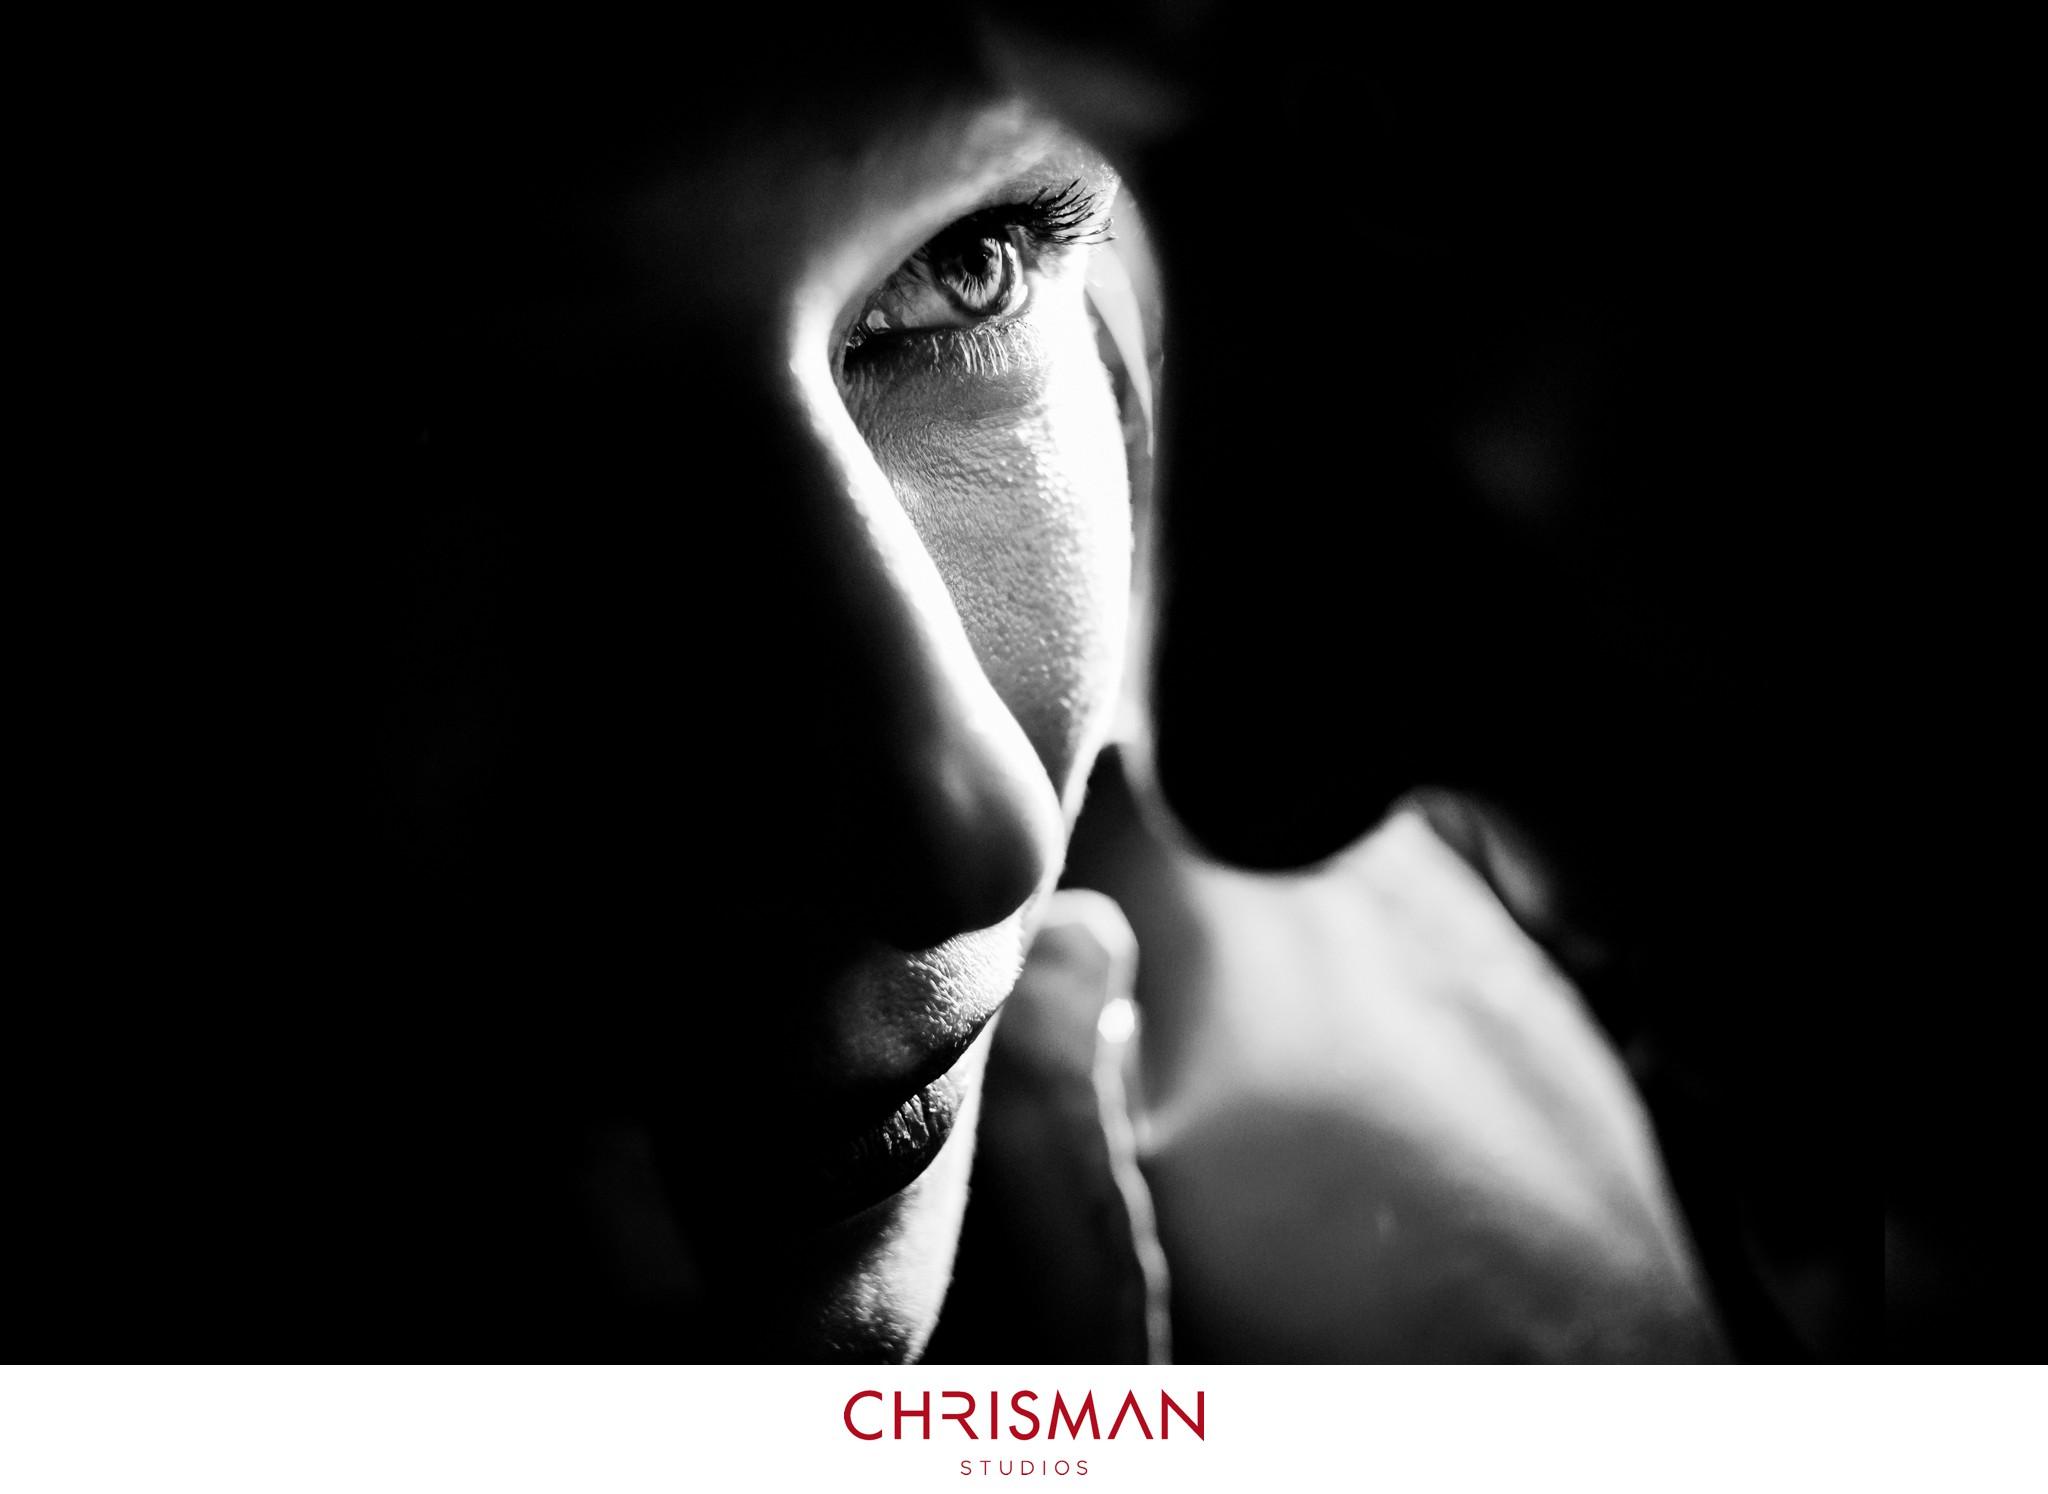 chrisman studios 07